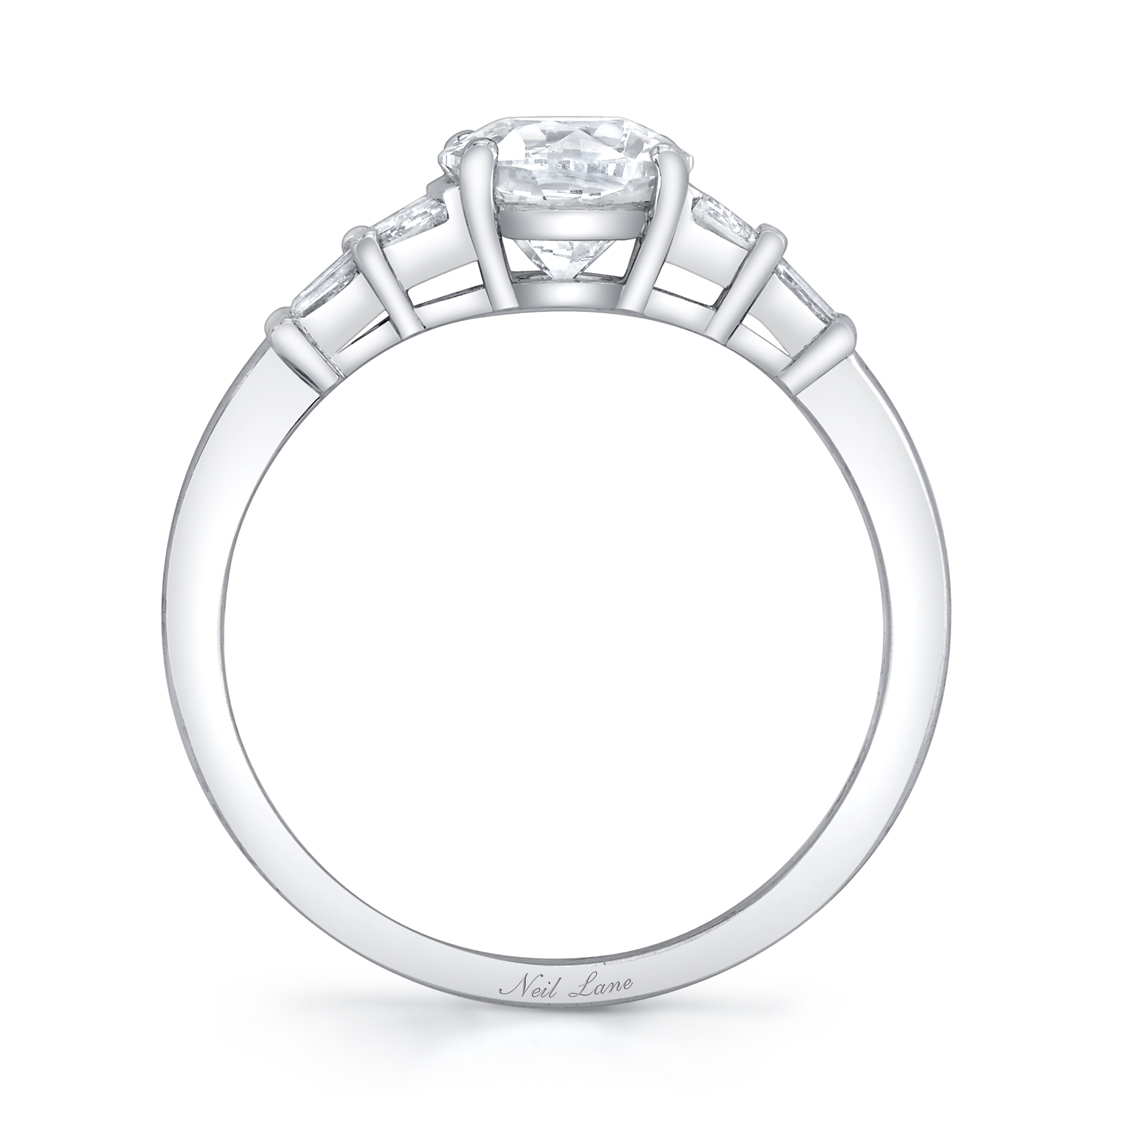 db0d53b05 Neil Lane designed Taylor Nolan's engagement ring from Derek Peth. (Photo  courtesy of Neil